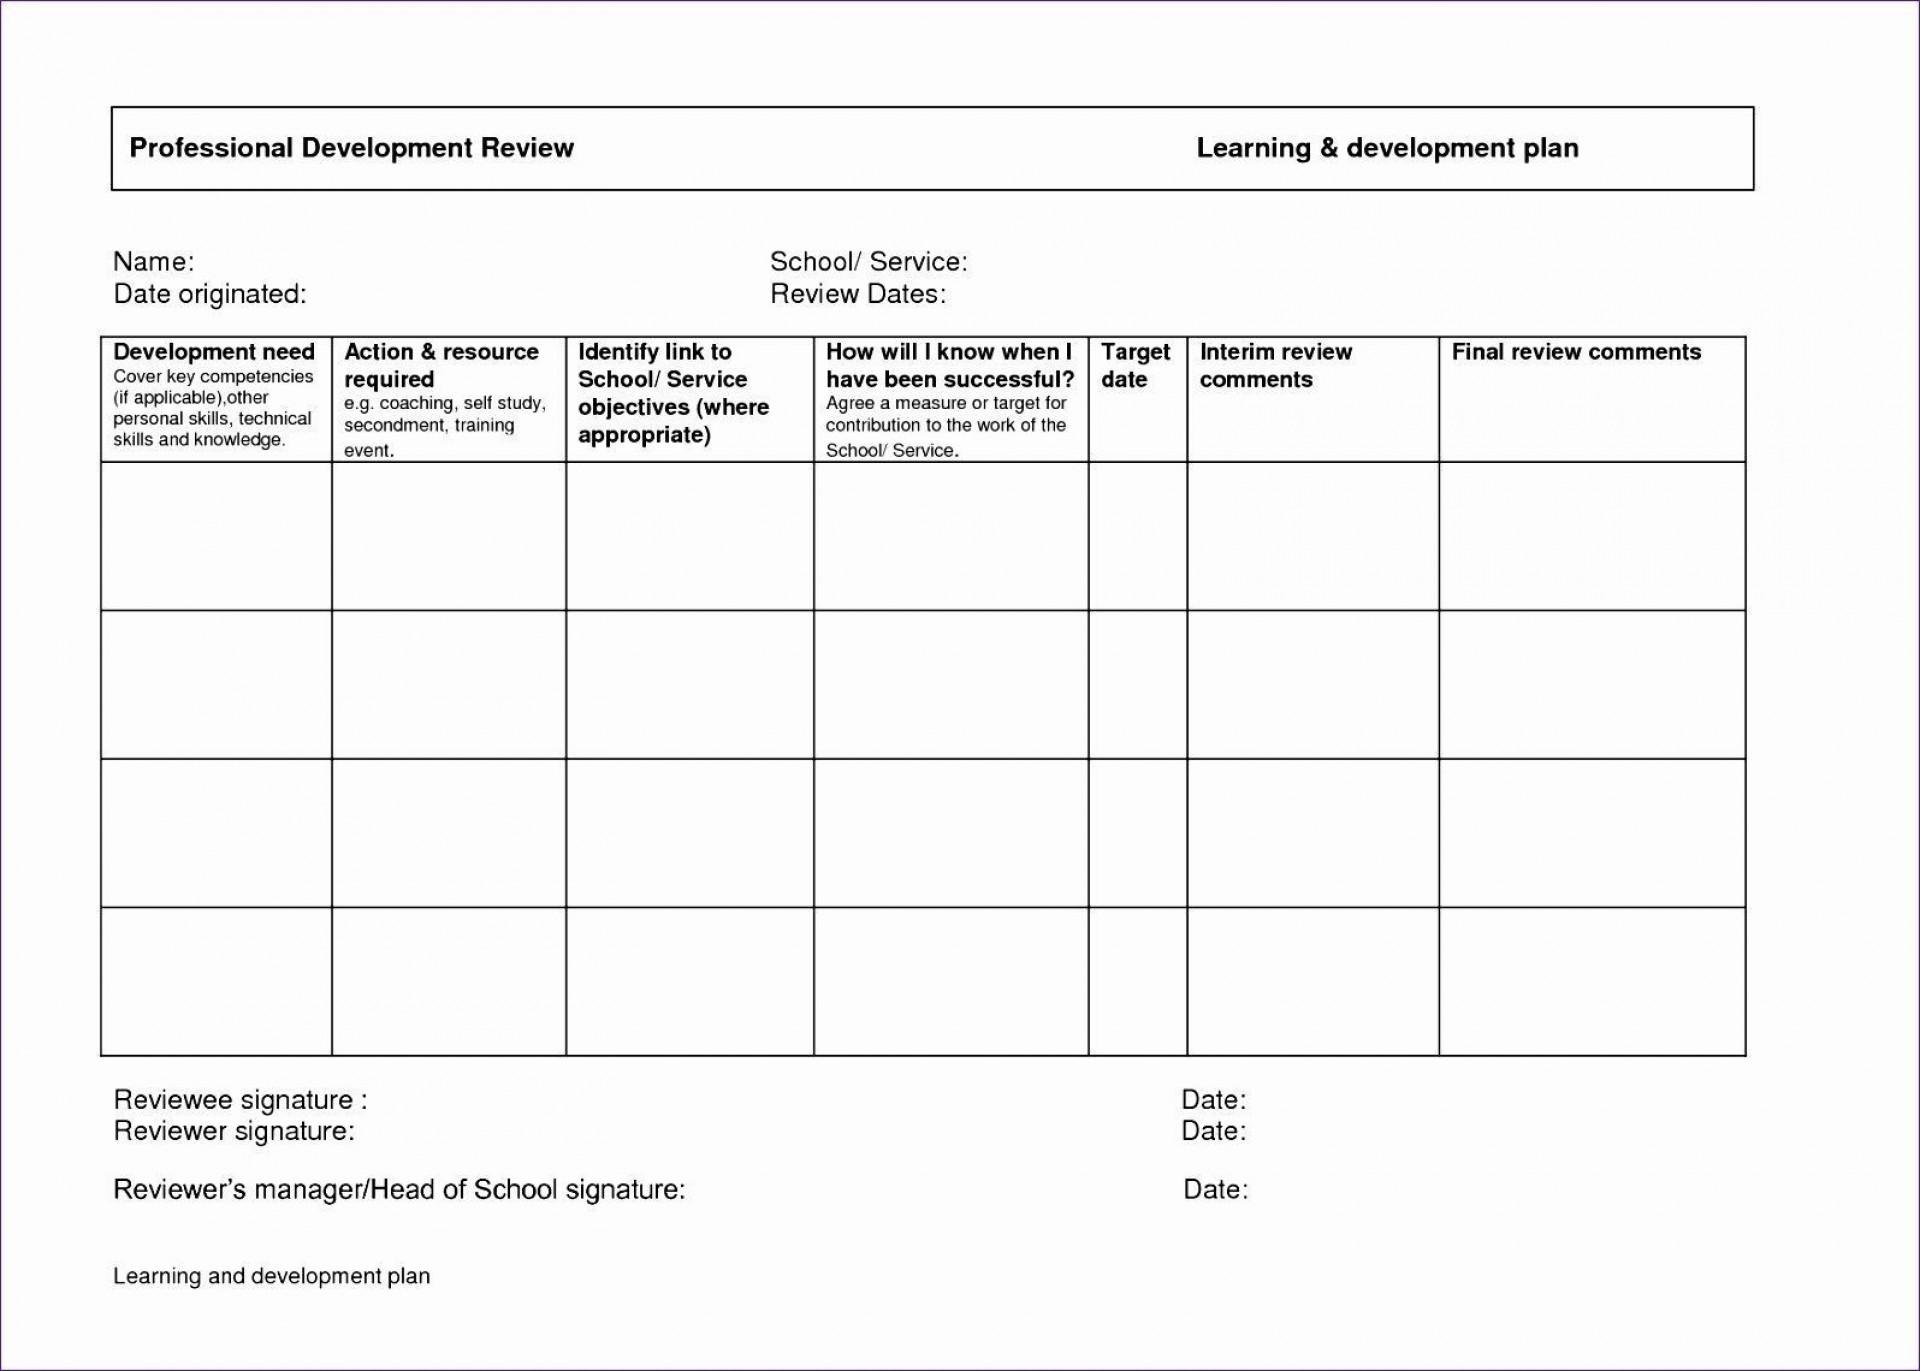 000 Best Personal Development Plan Template Excel Photo  Sample1920